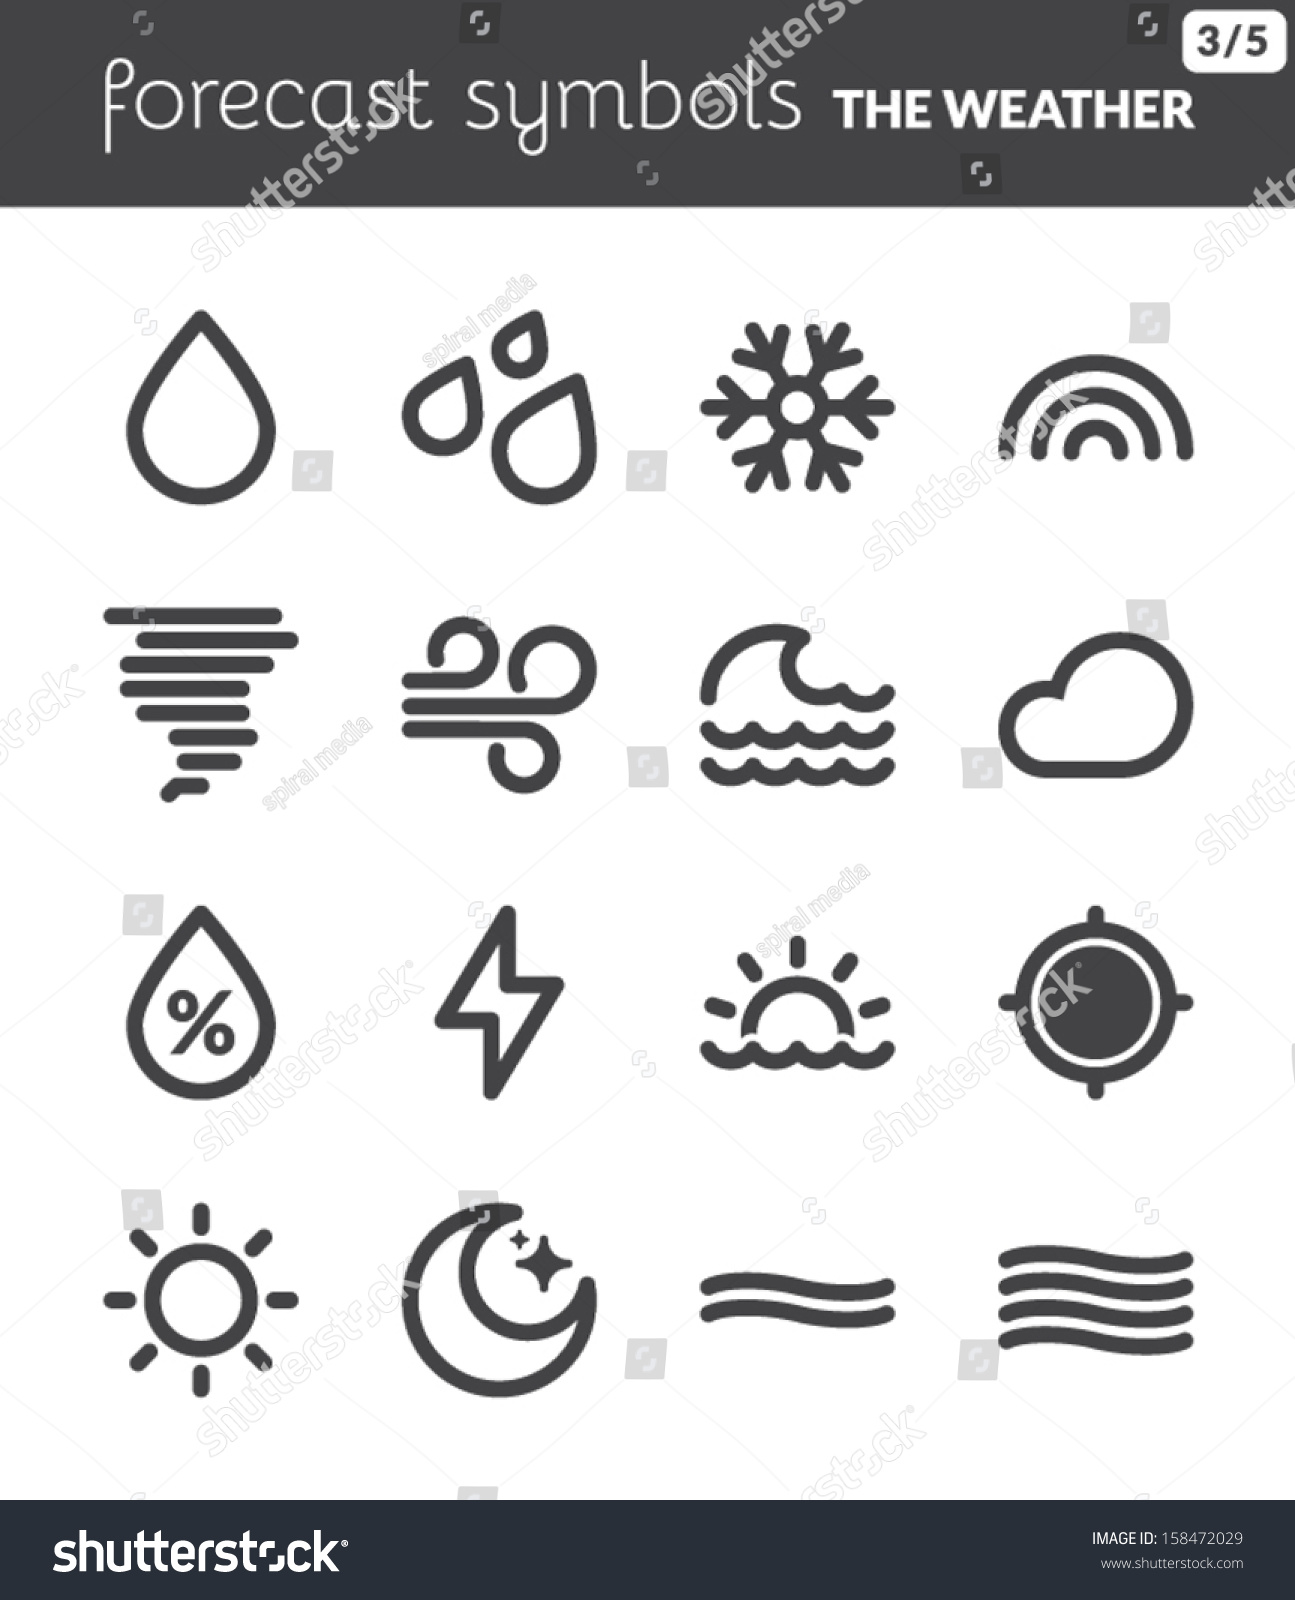 Noaa Weather Map Symbols X Xp 2018